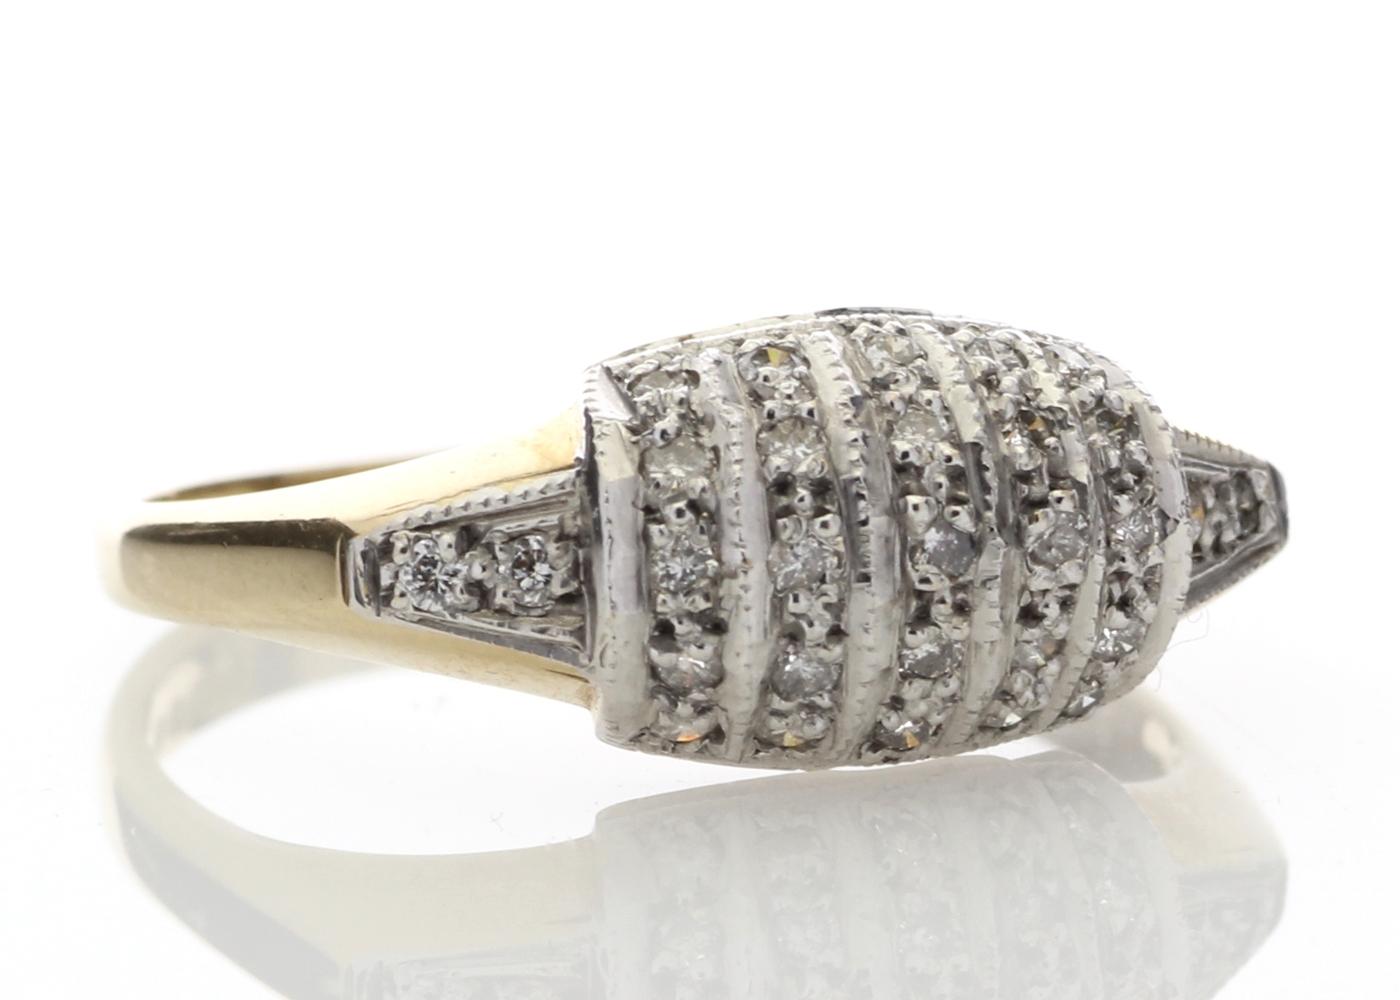 9ct Ladies Dress Diamond Ring 0.29 Carats - Image 4 of 4